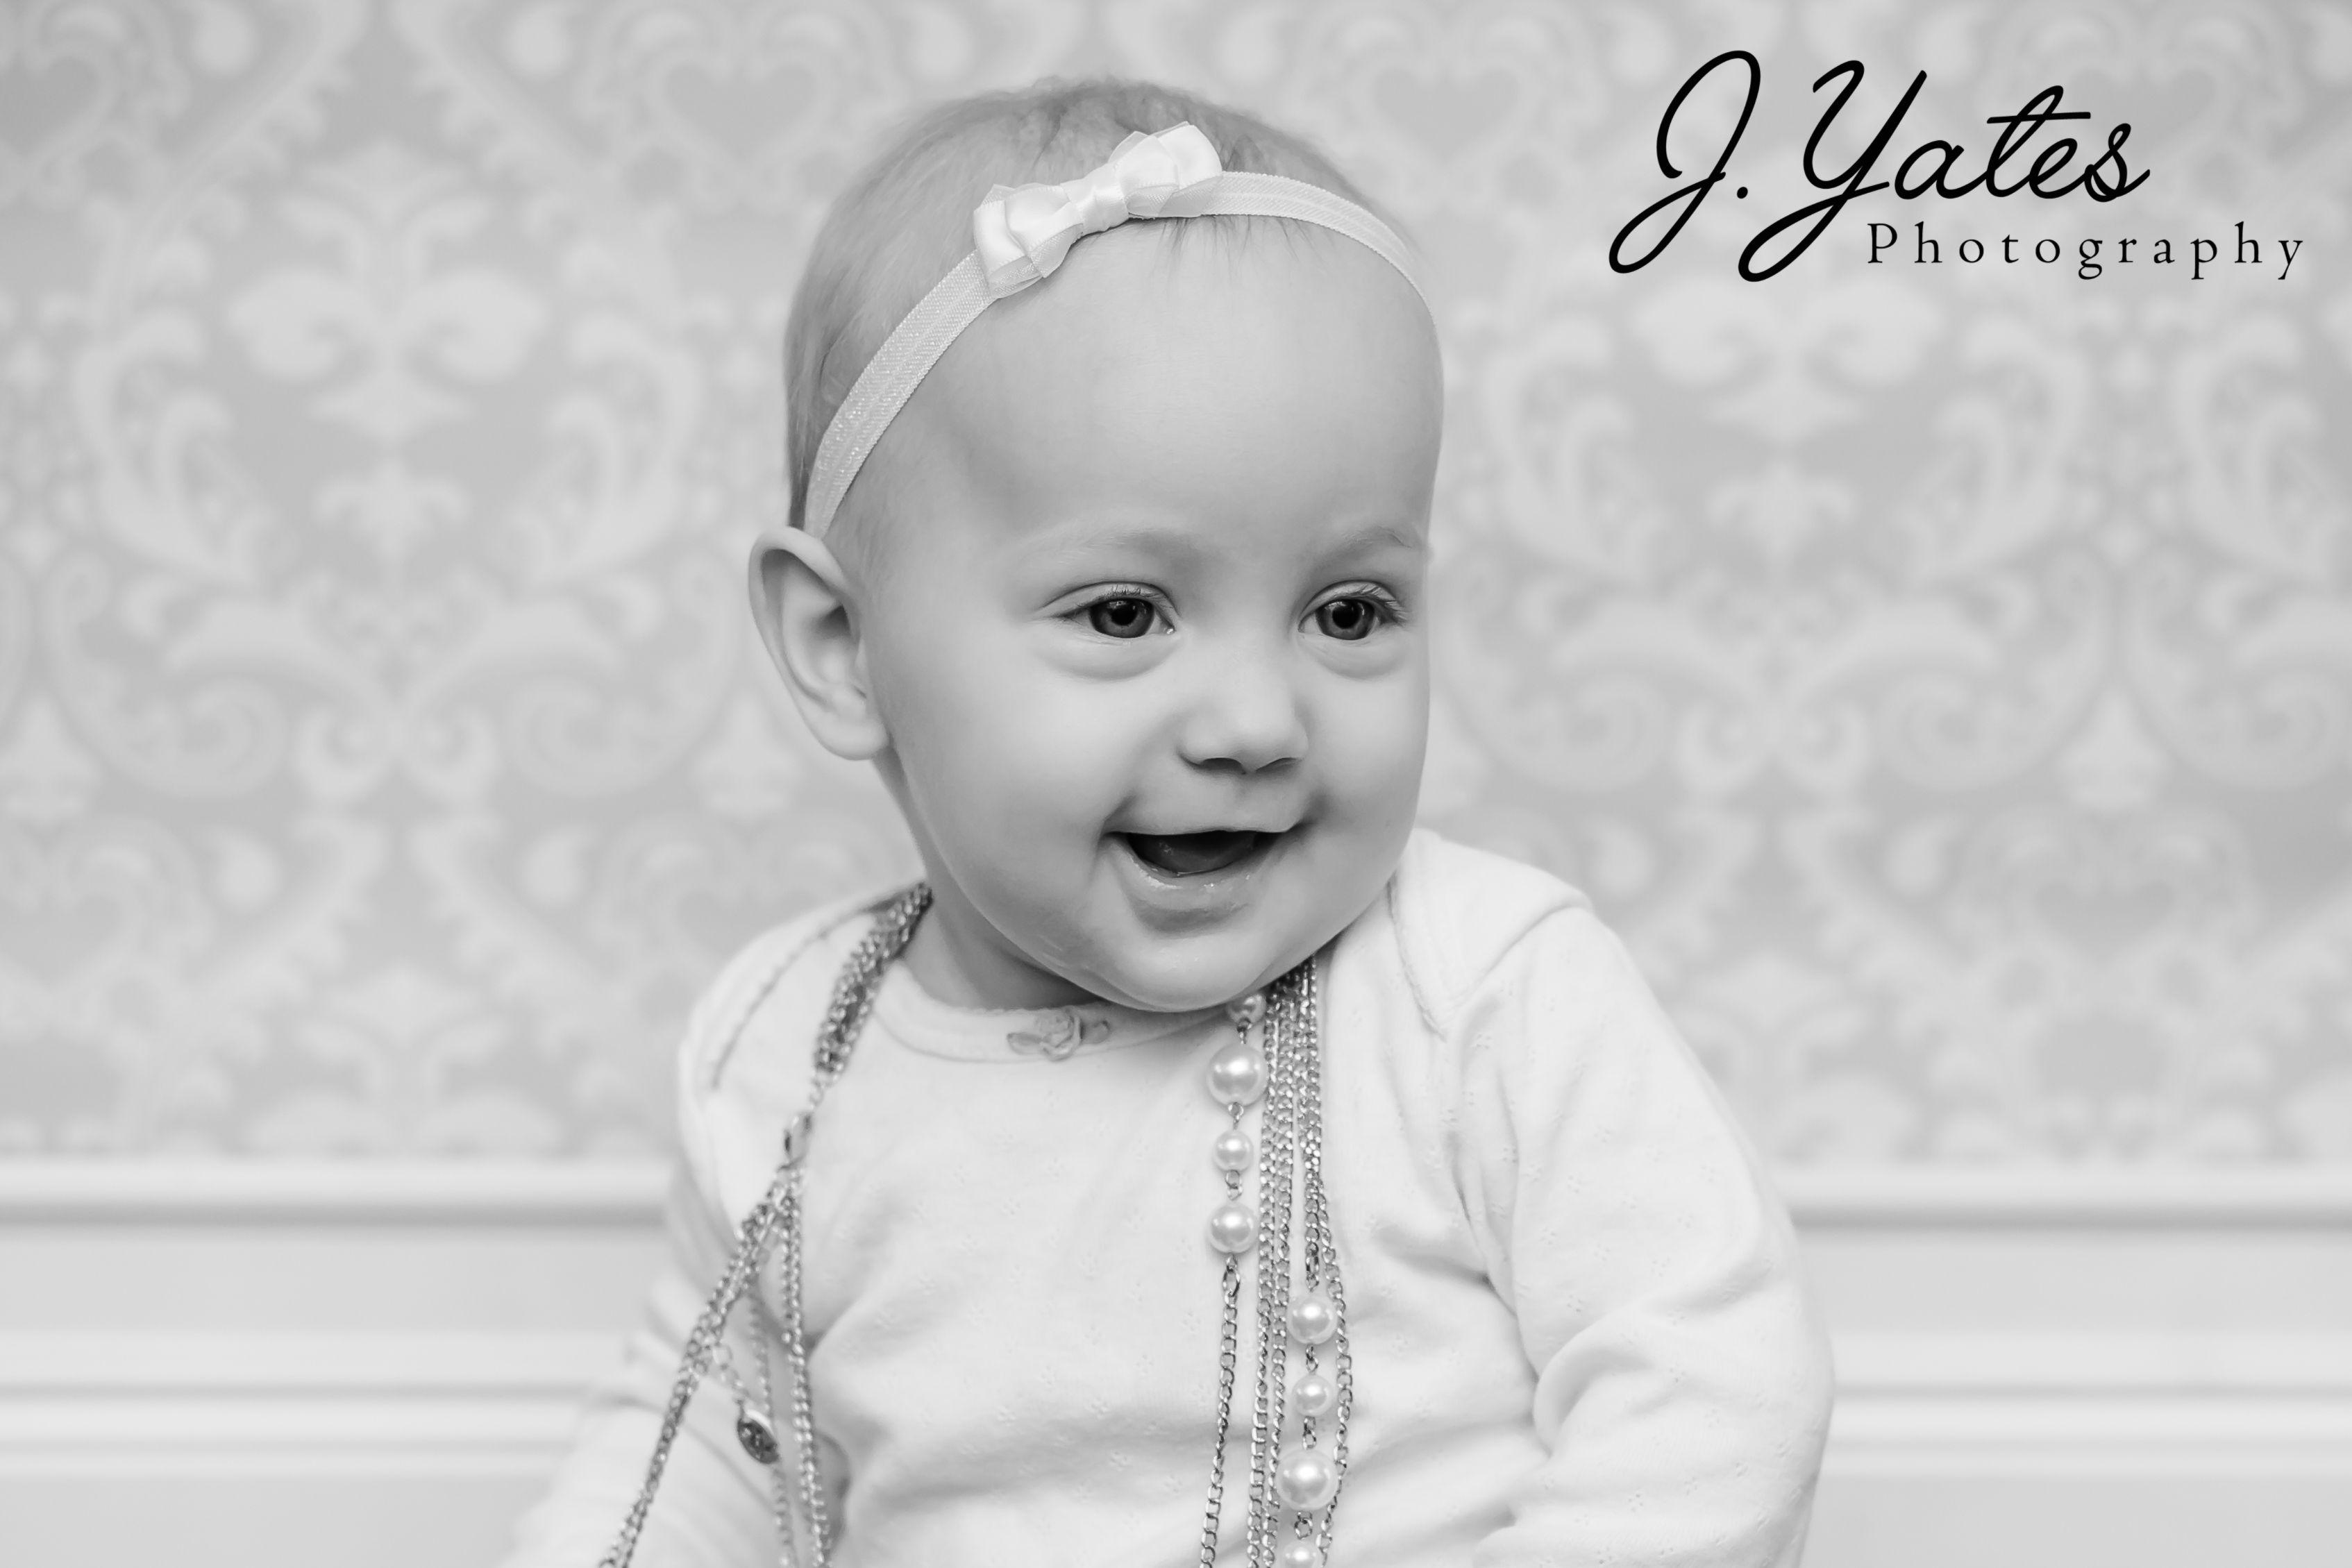 6 month baby girl photography session damascus md dc metro family children maternity newborn photographe